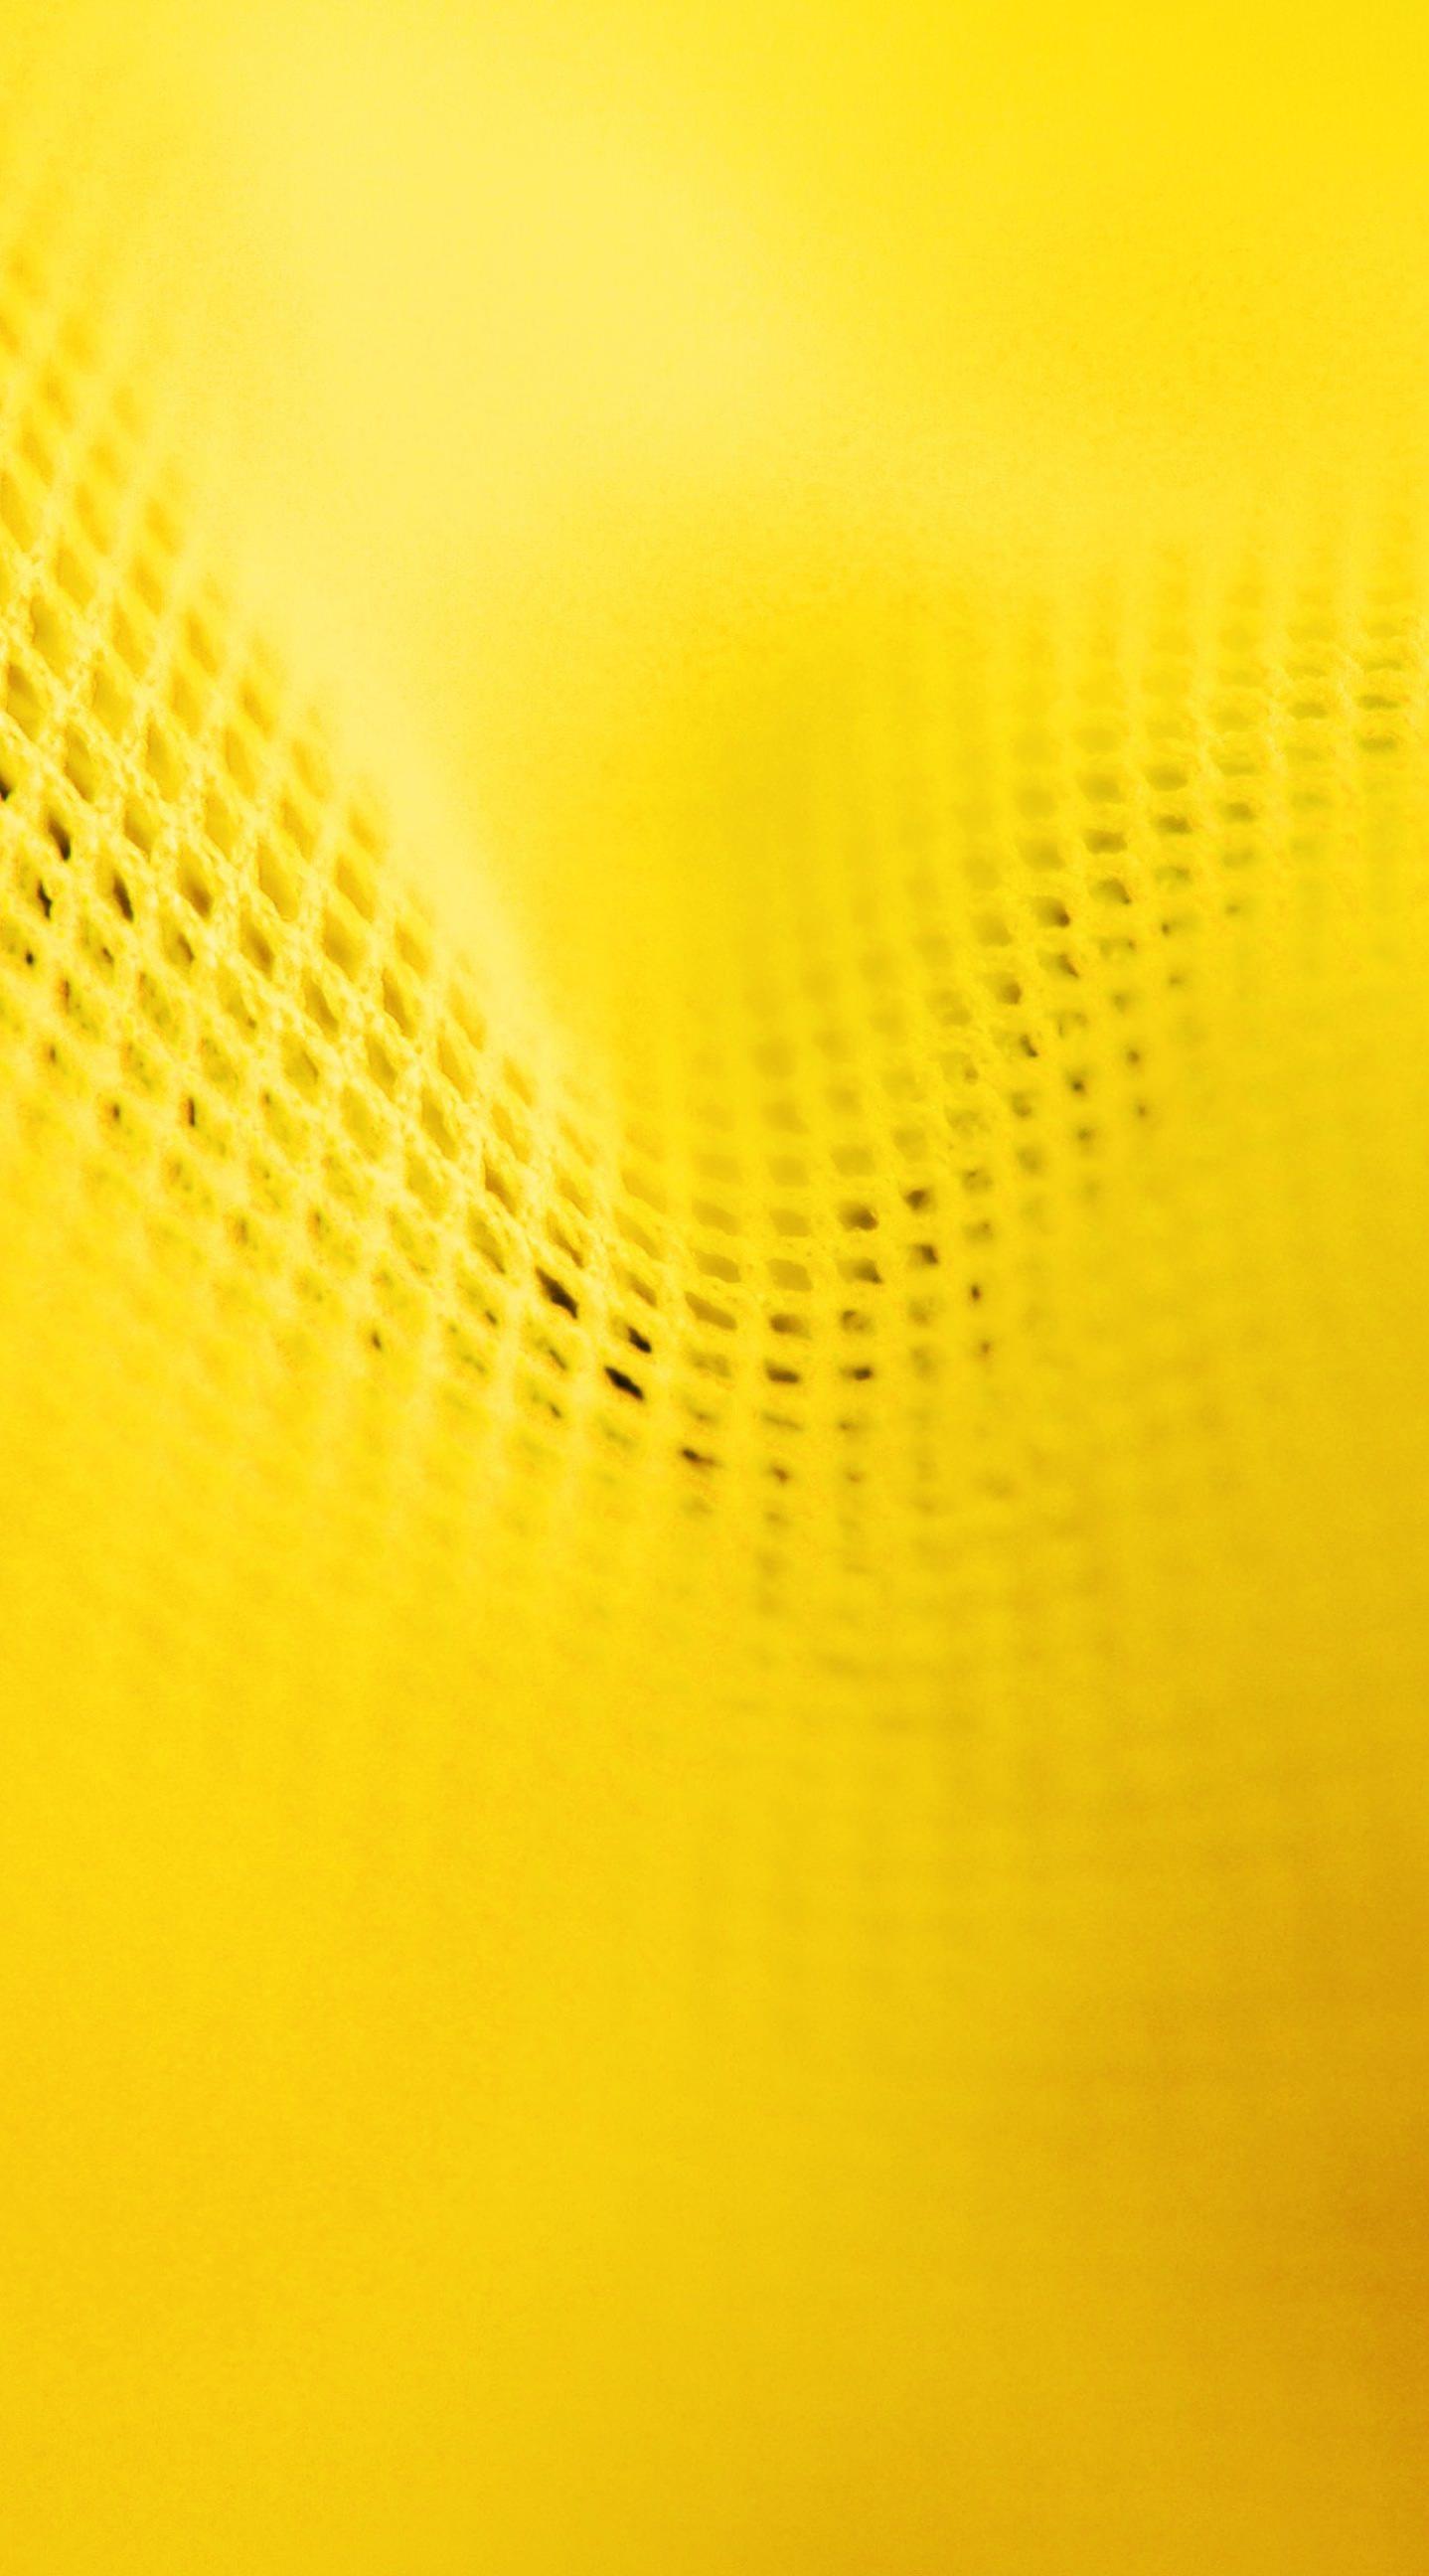 Wallpaper iphone kuning - Iphone 6s Plus Iphone 6 Plus Wallpaper